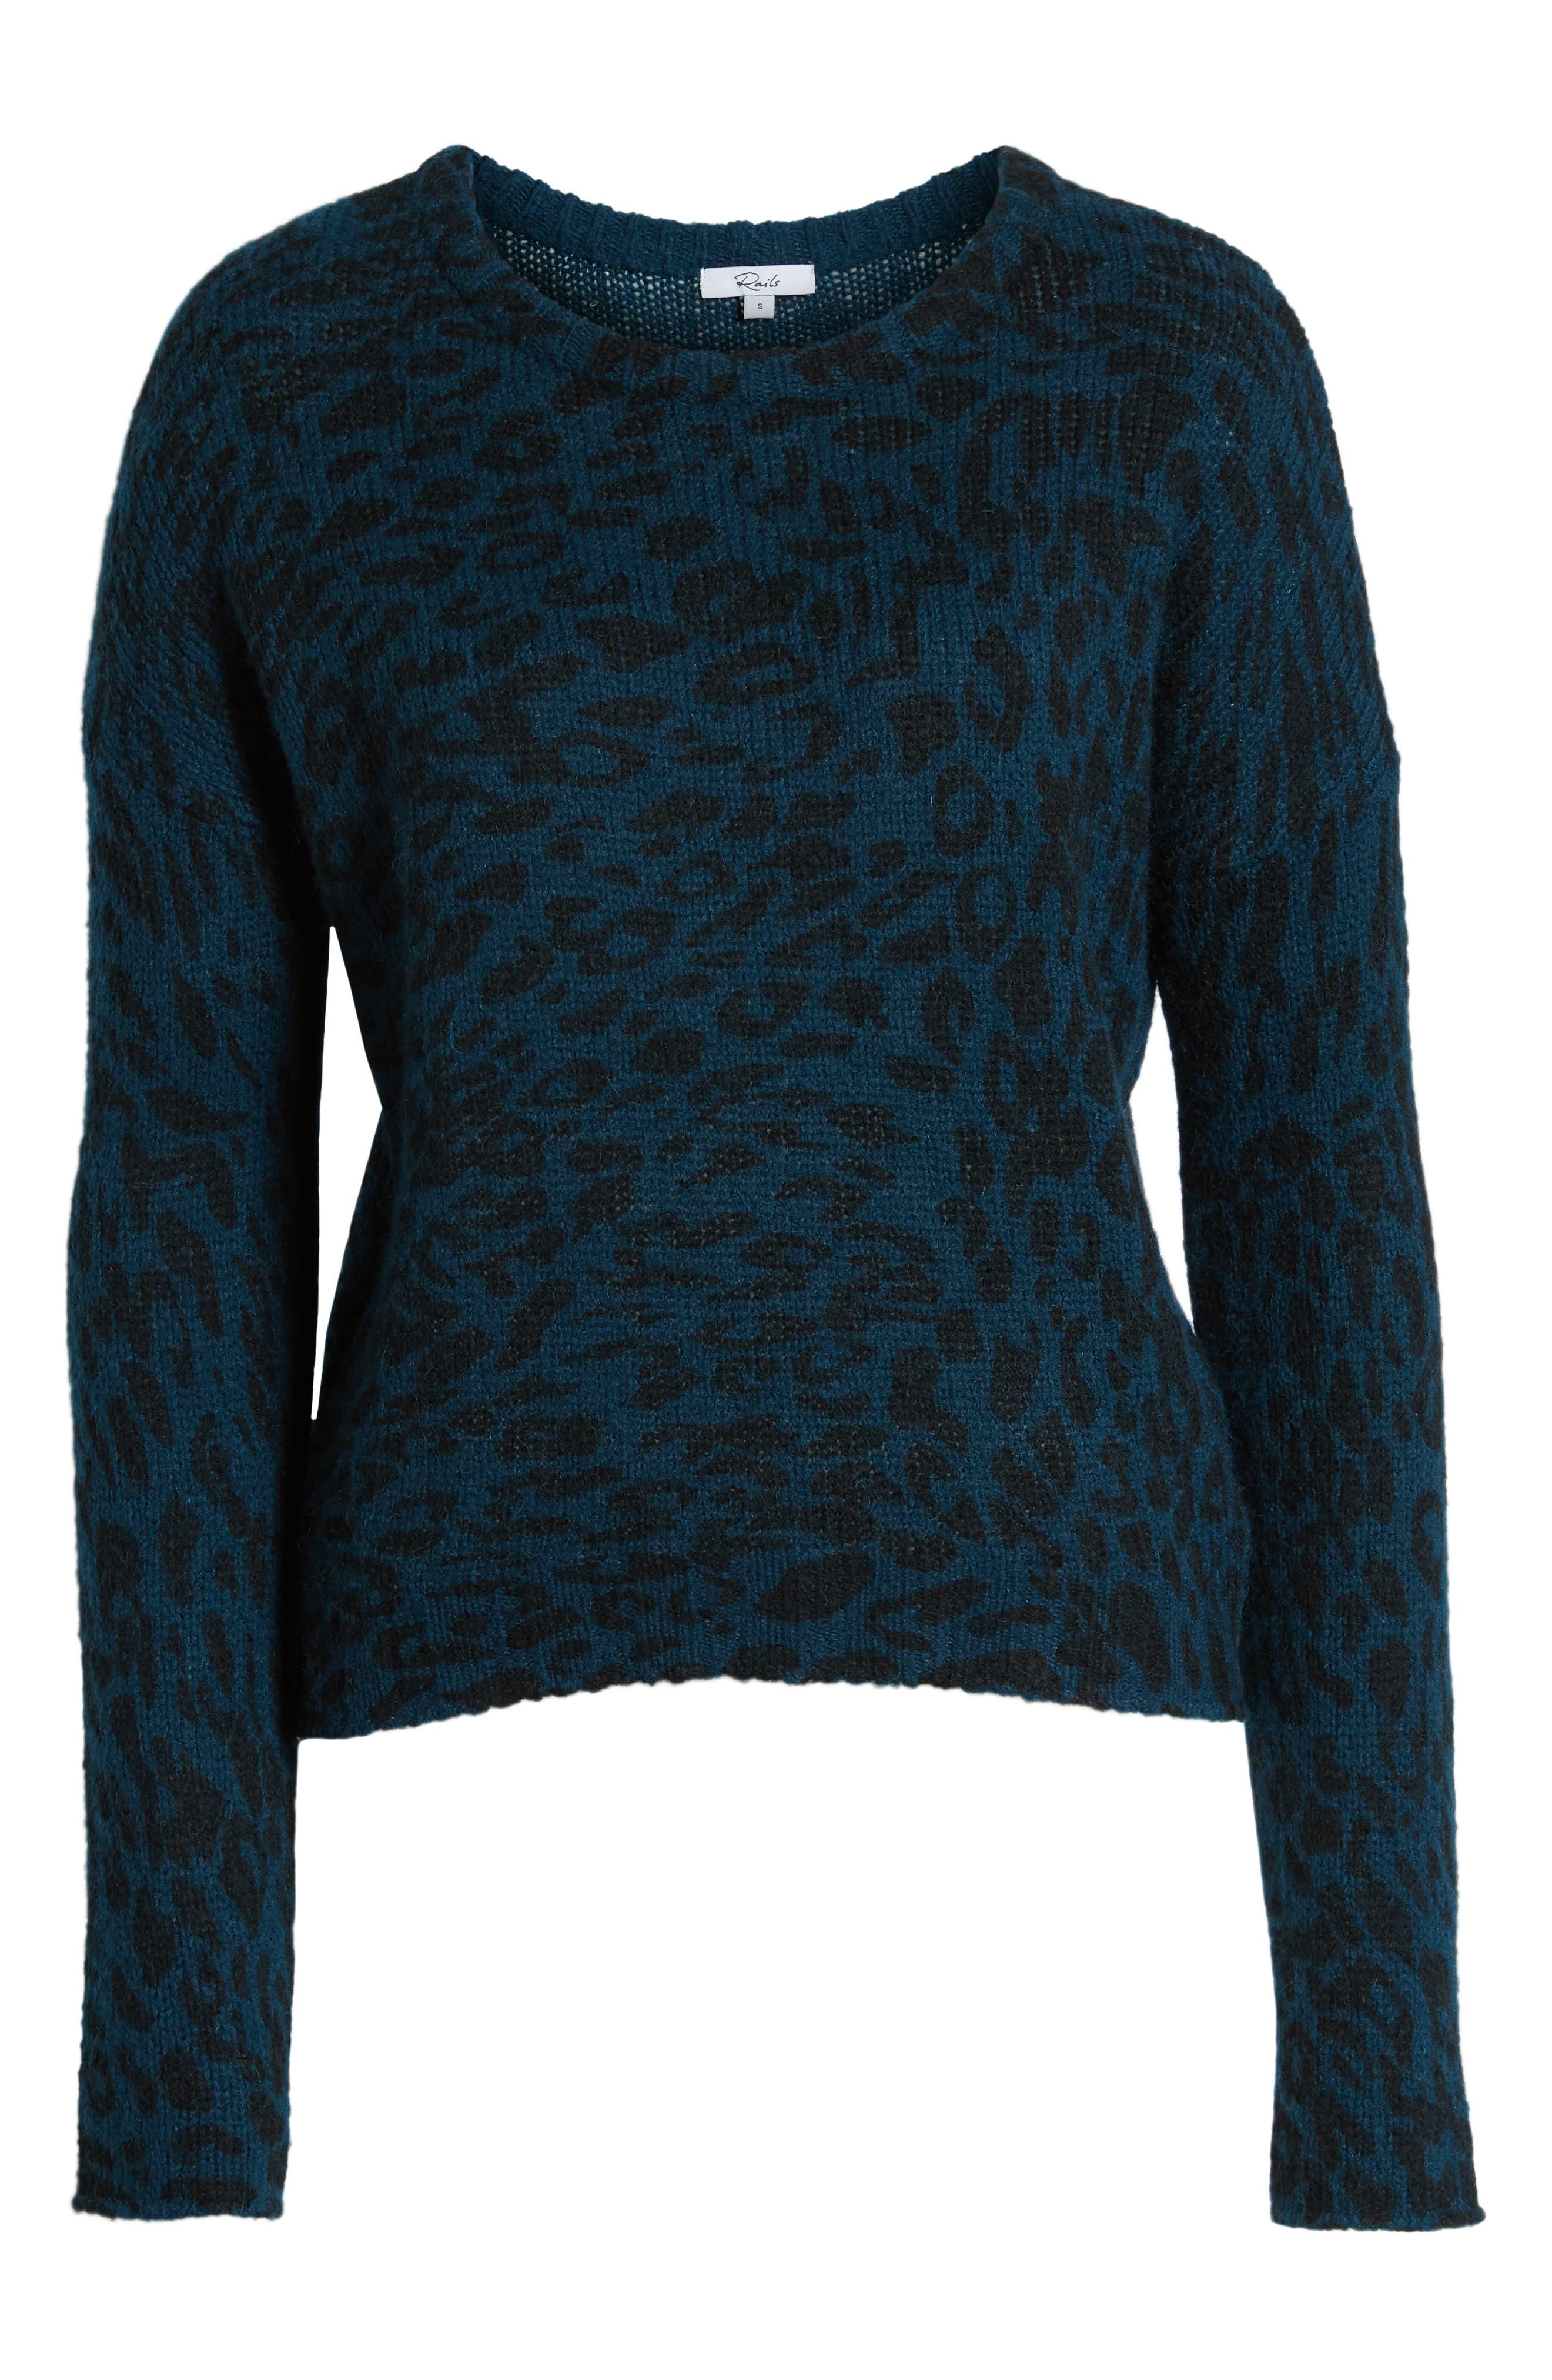 Donovan Animal Print Sweater,                             Alternate thumbnail 6, color,                             BLUE LEOPARD